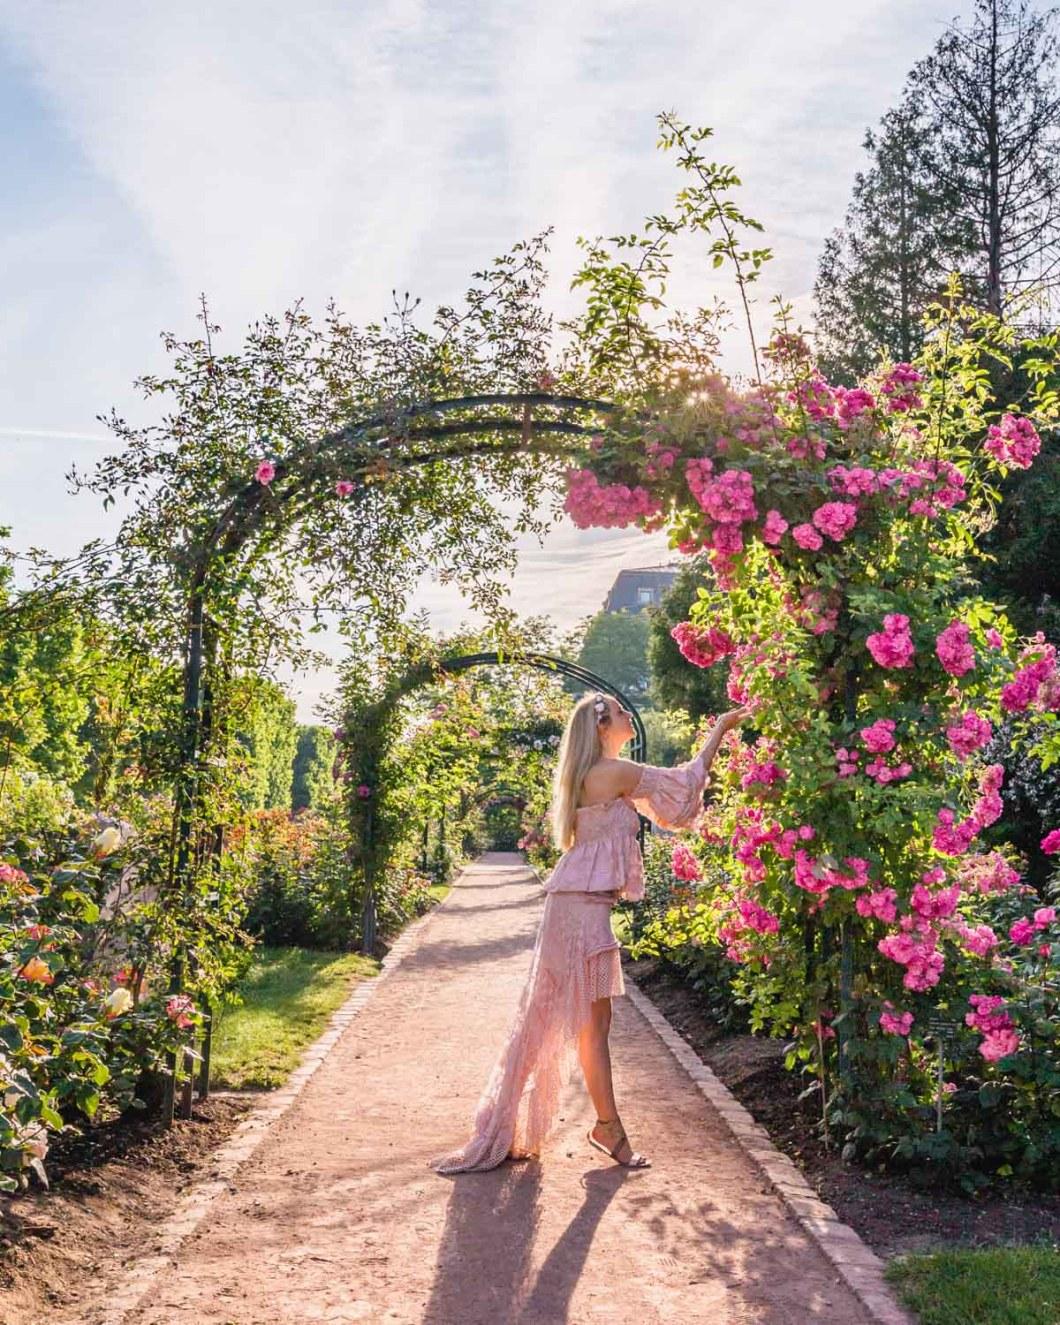 Roses in the Jardin des Plantes - Paris